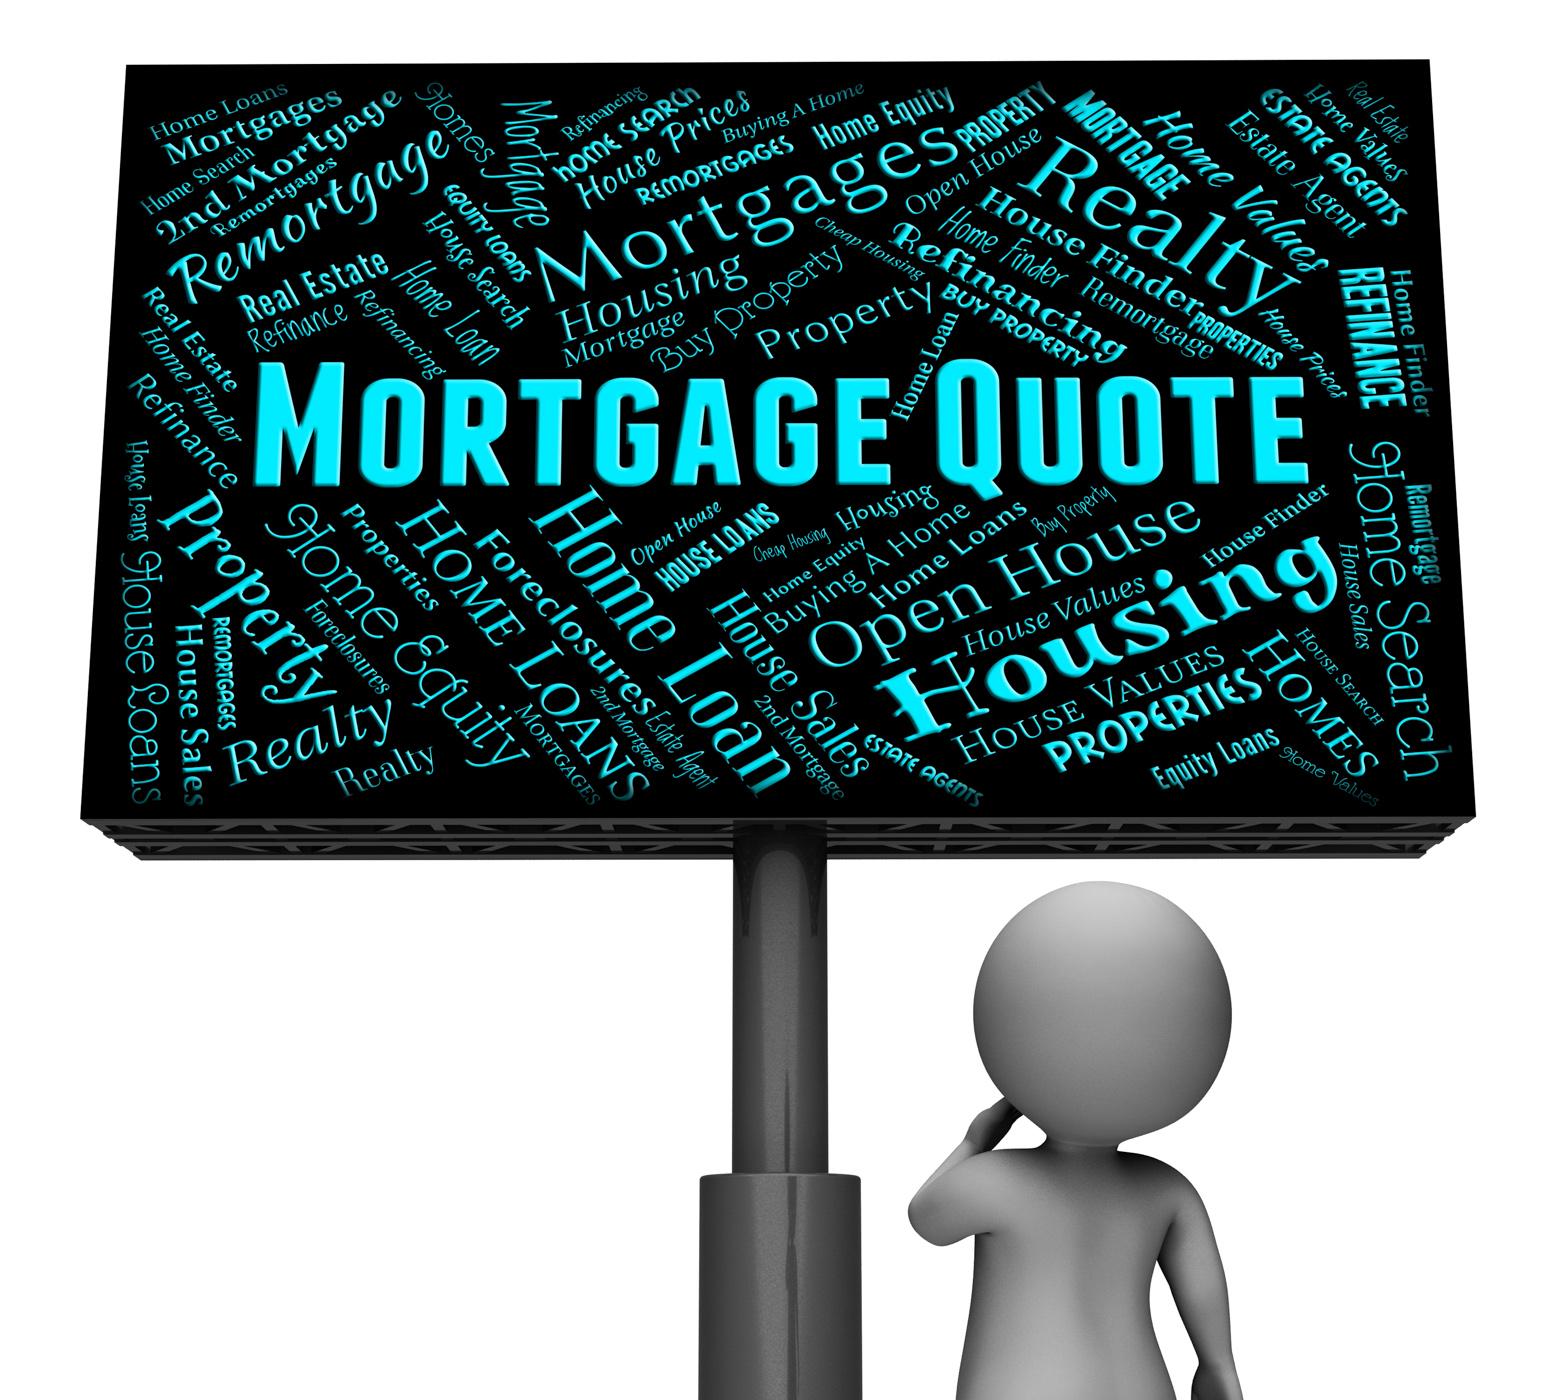 Mortgage quote represents real estate and board photo